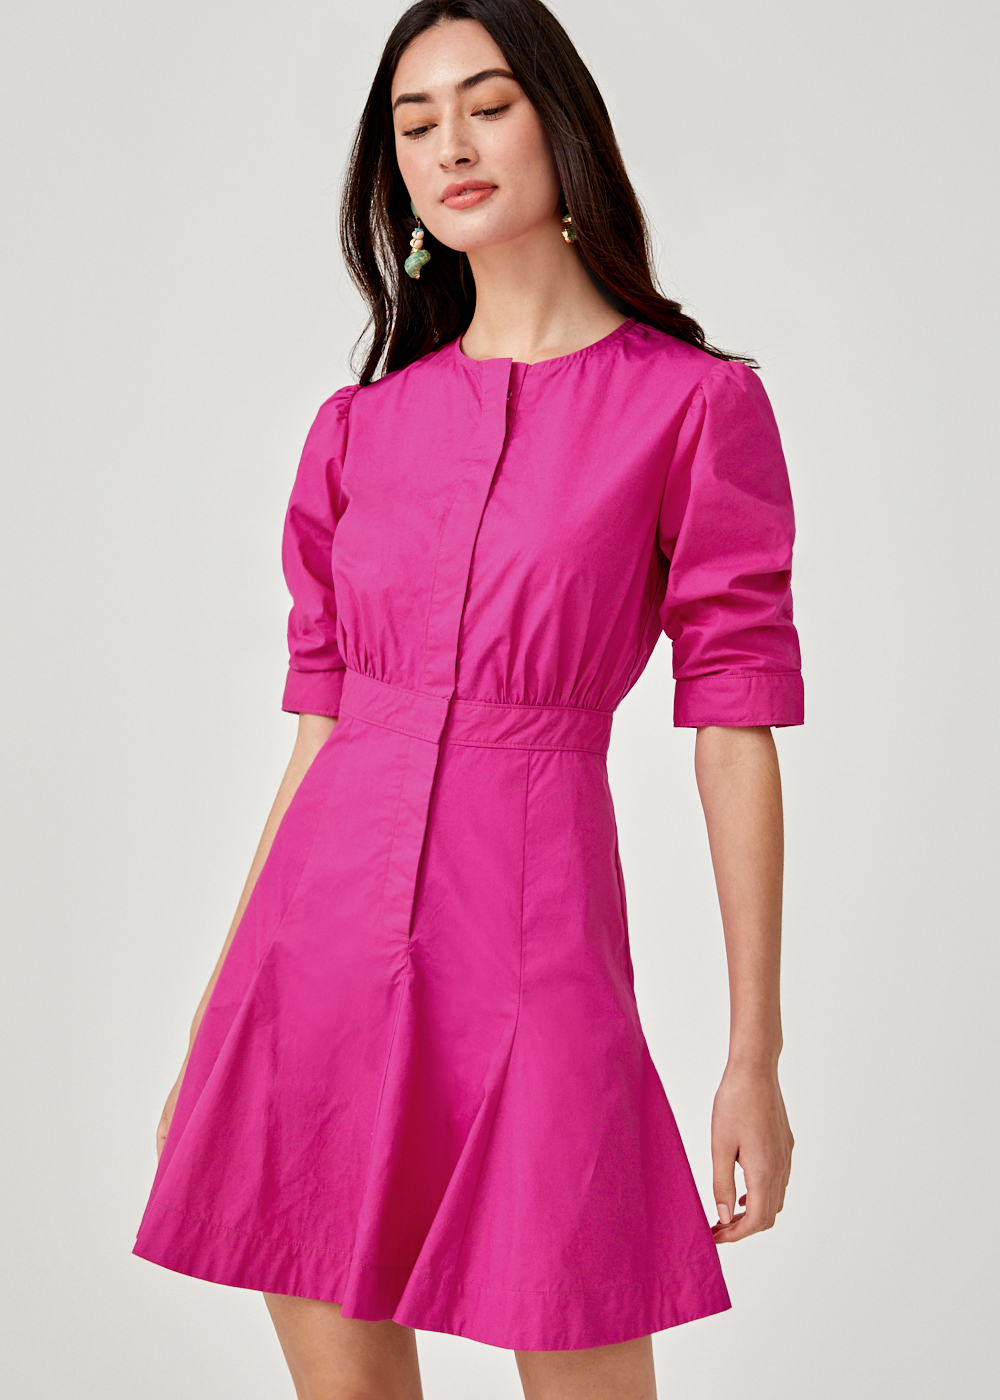 Cyane A-line Shirt Dress